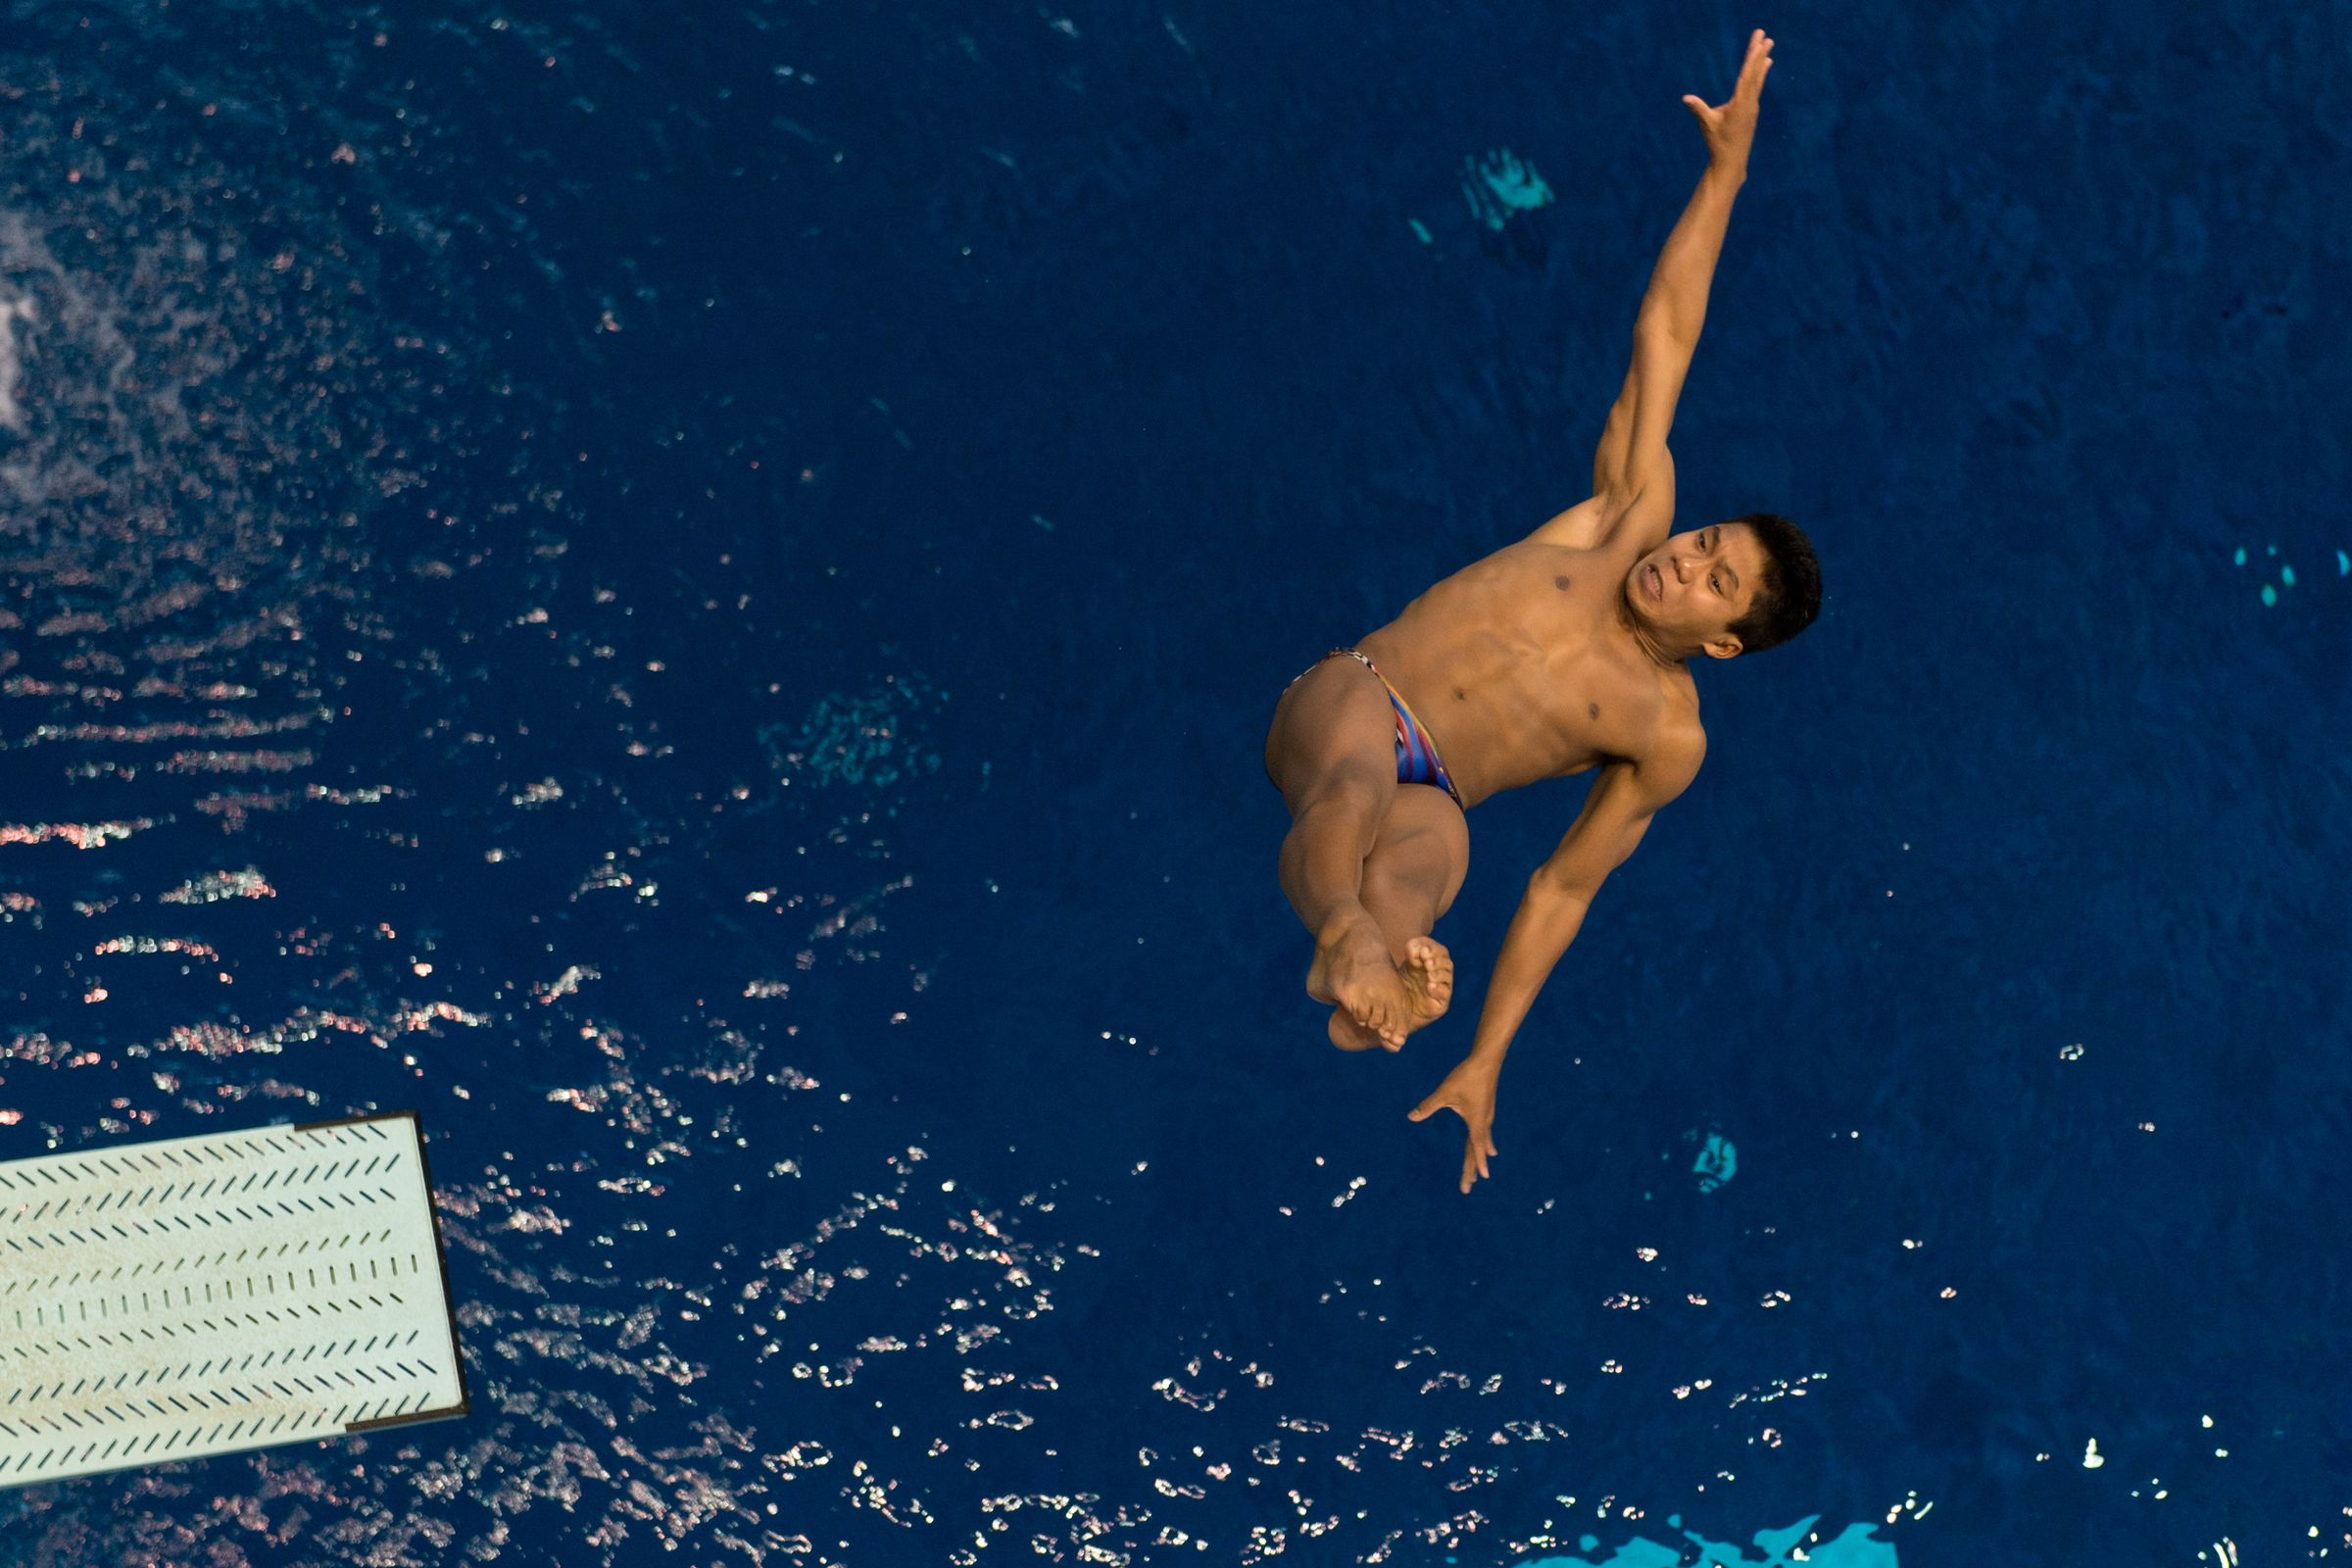 Cuba hosting 2015 pan american junior diving championships - Dive recorder results ...